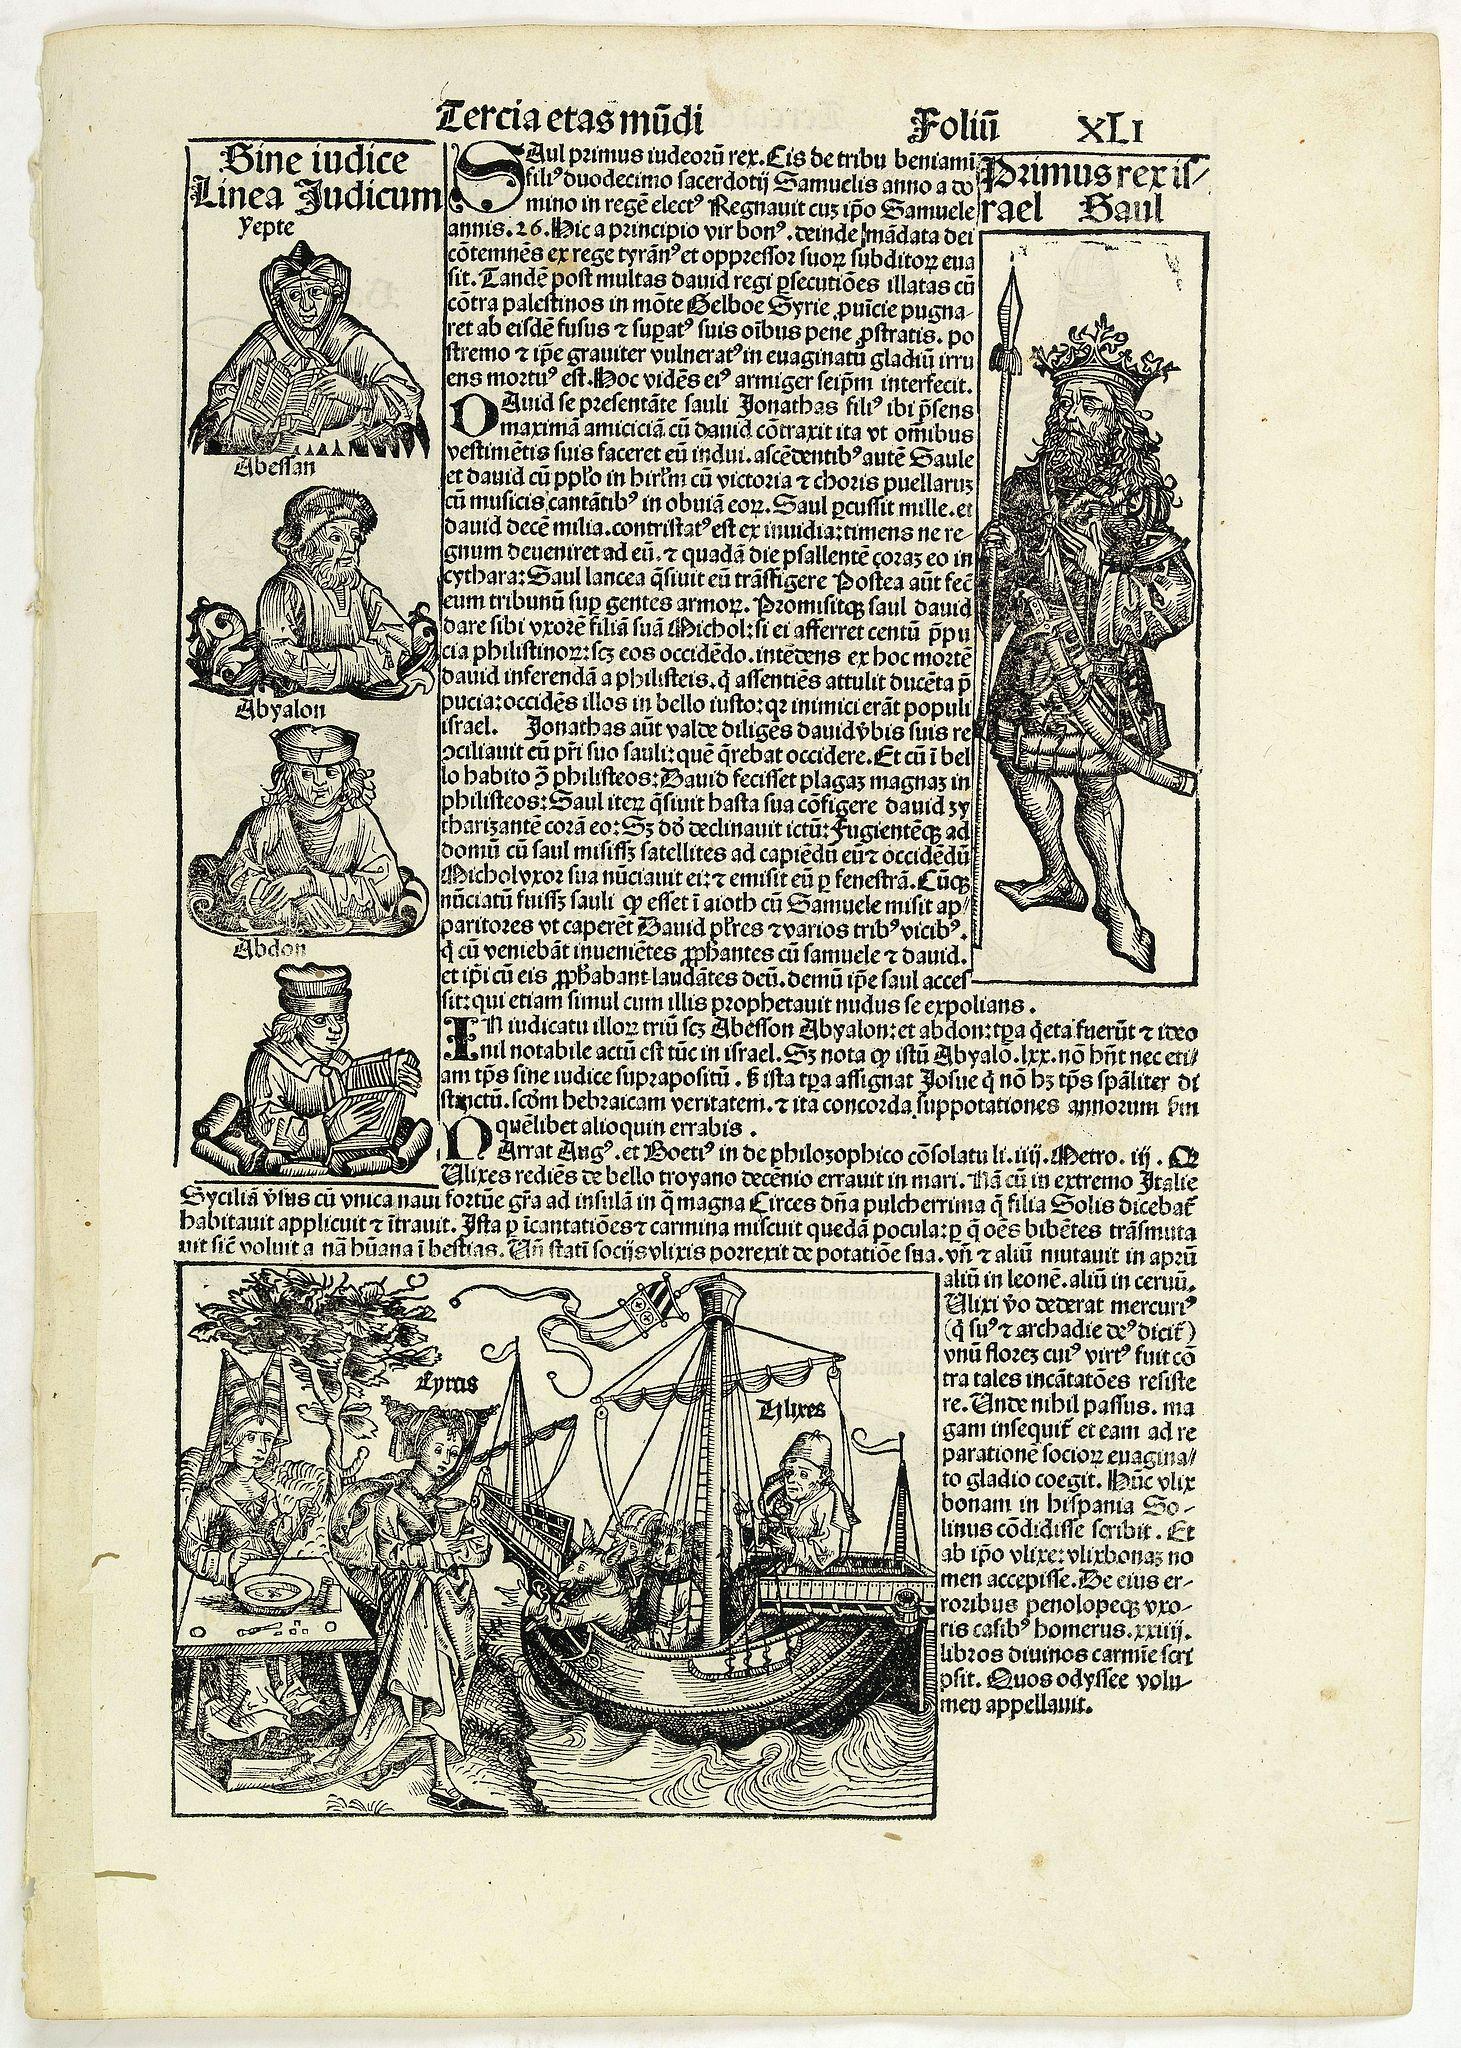 SCHEDEL, H. -  Tercia Etas Mundi. Folium.XLI